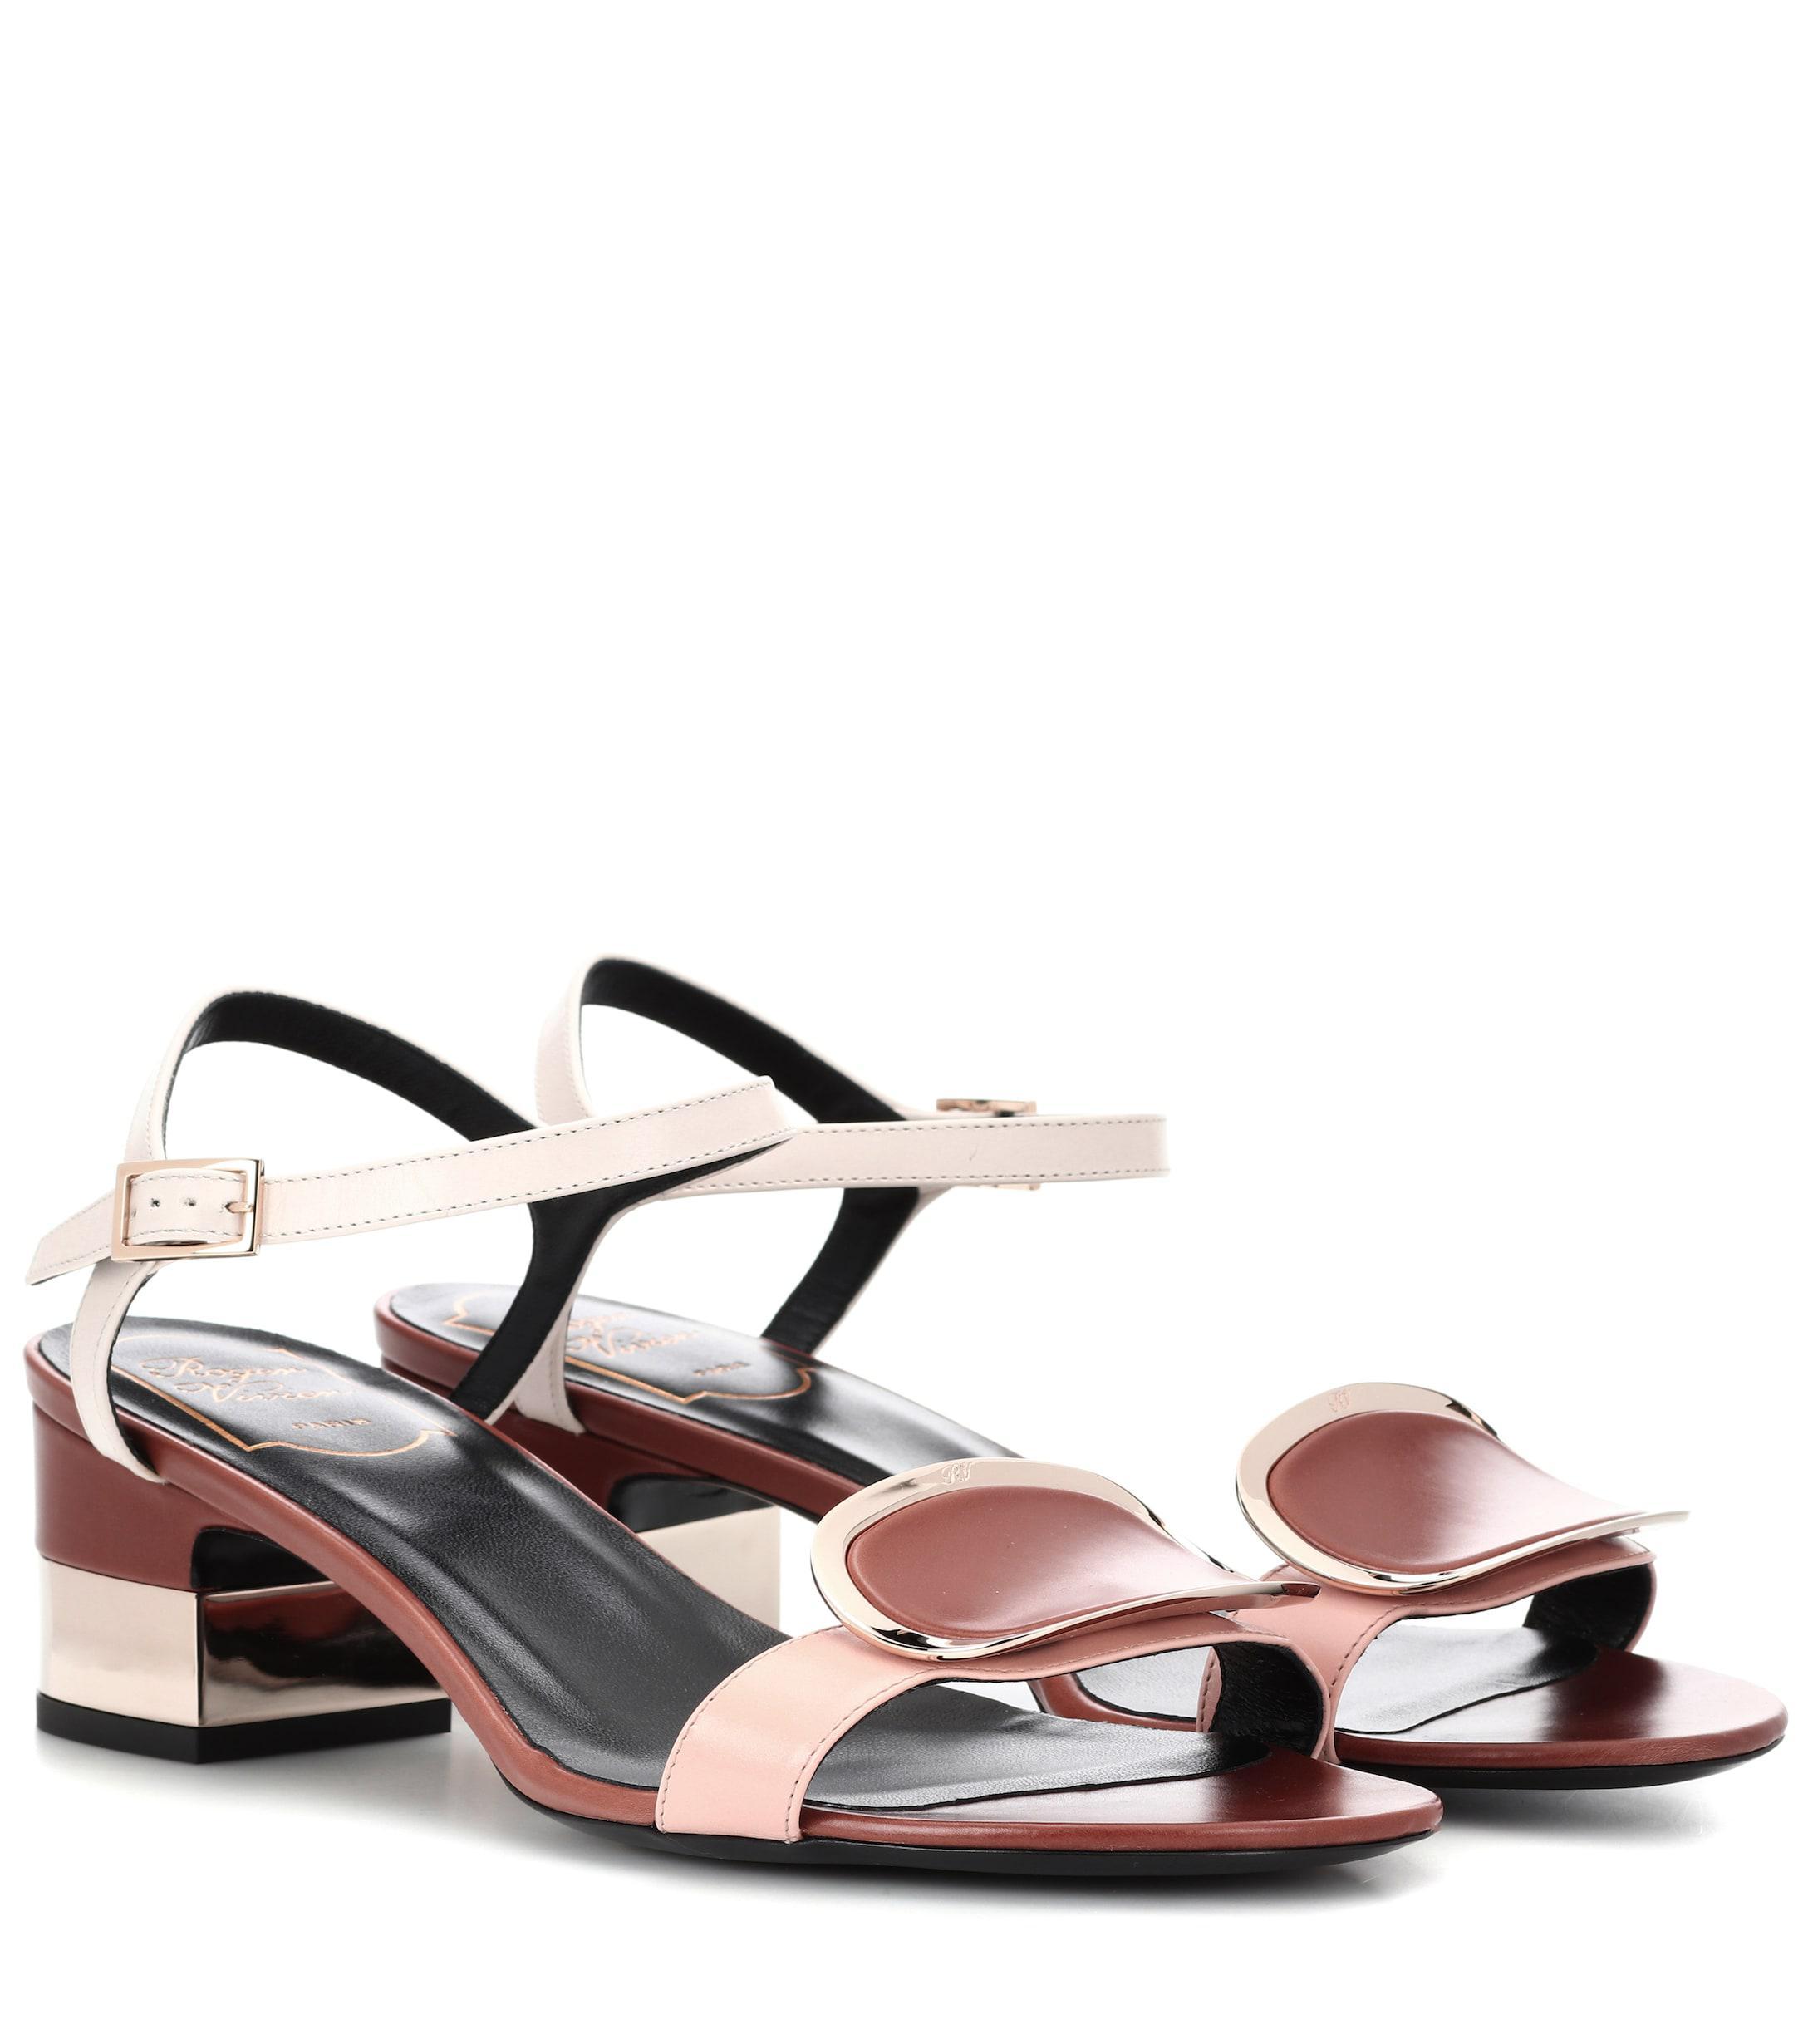 edc6d4c762ee Roger Vivier. Women s Chips West Buckle Leather Sandals